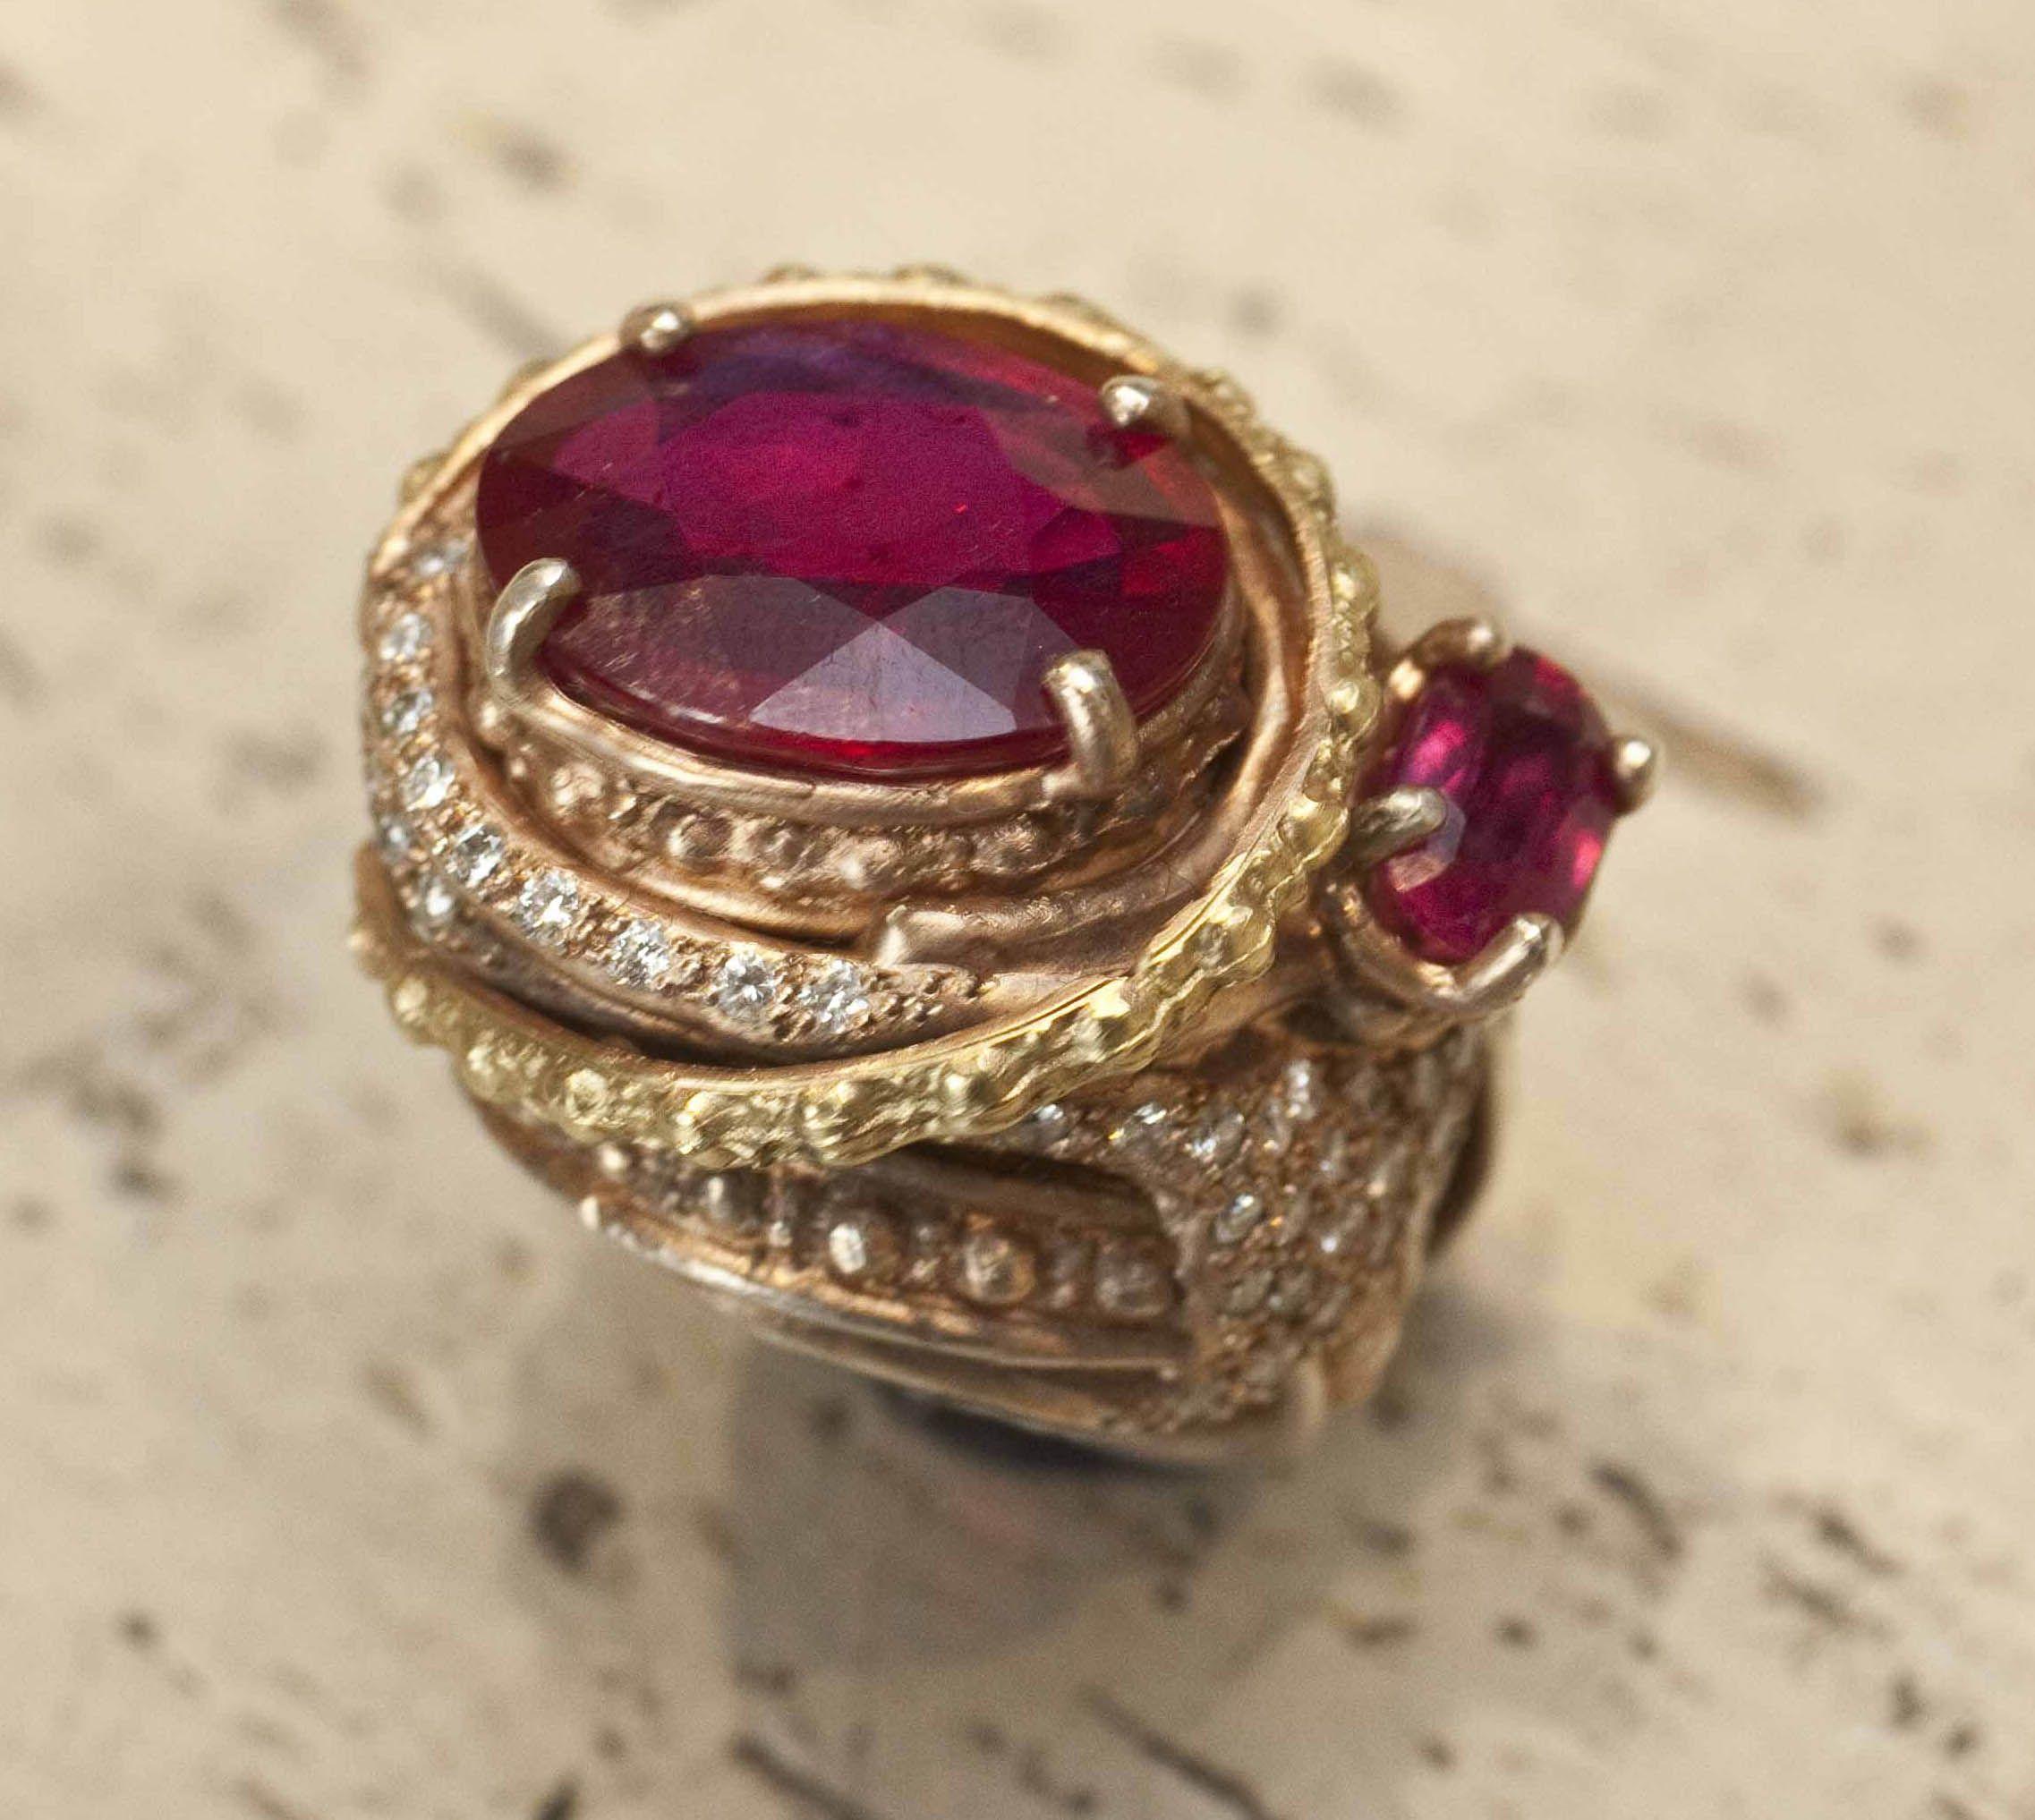 Gold and fuscia design #jewlery #rings #gioielli #giuseppinafermi #accesories #madeinitaly